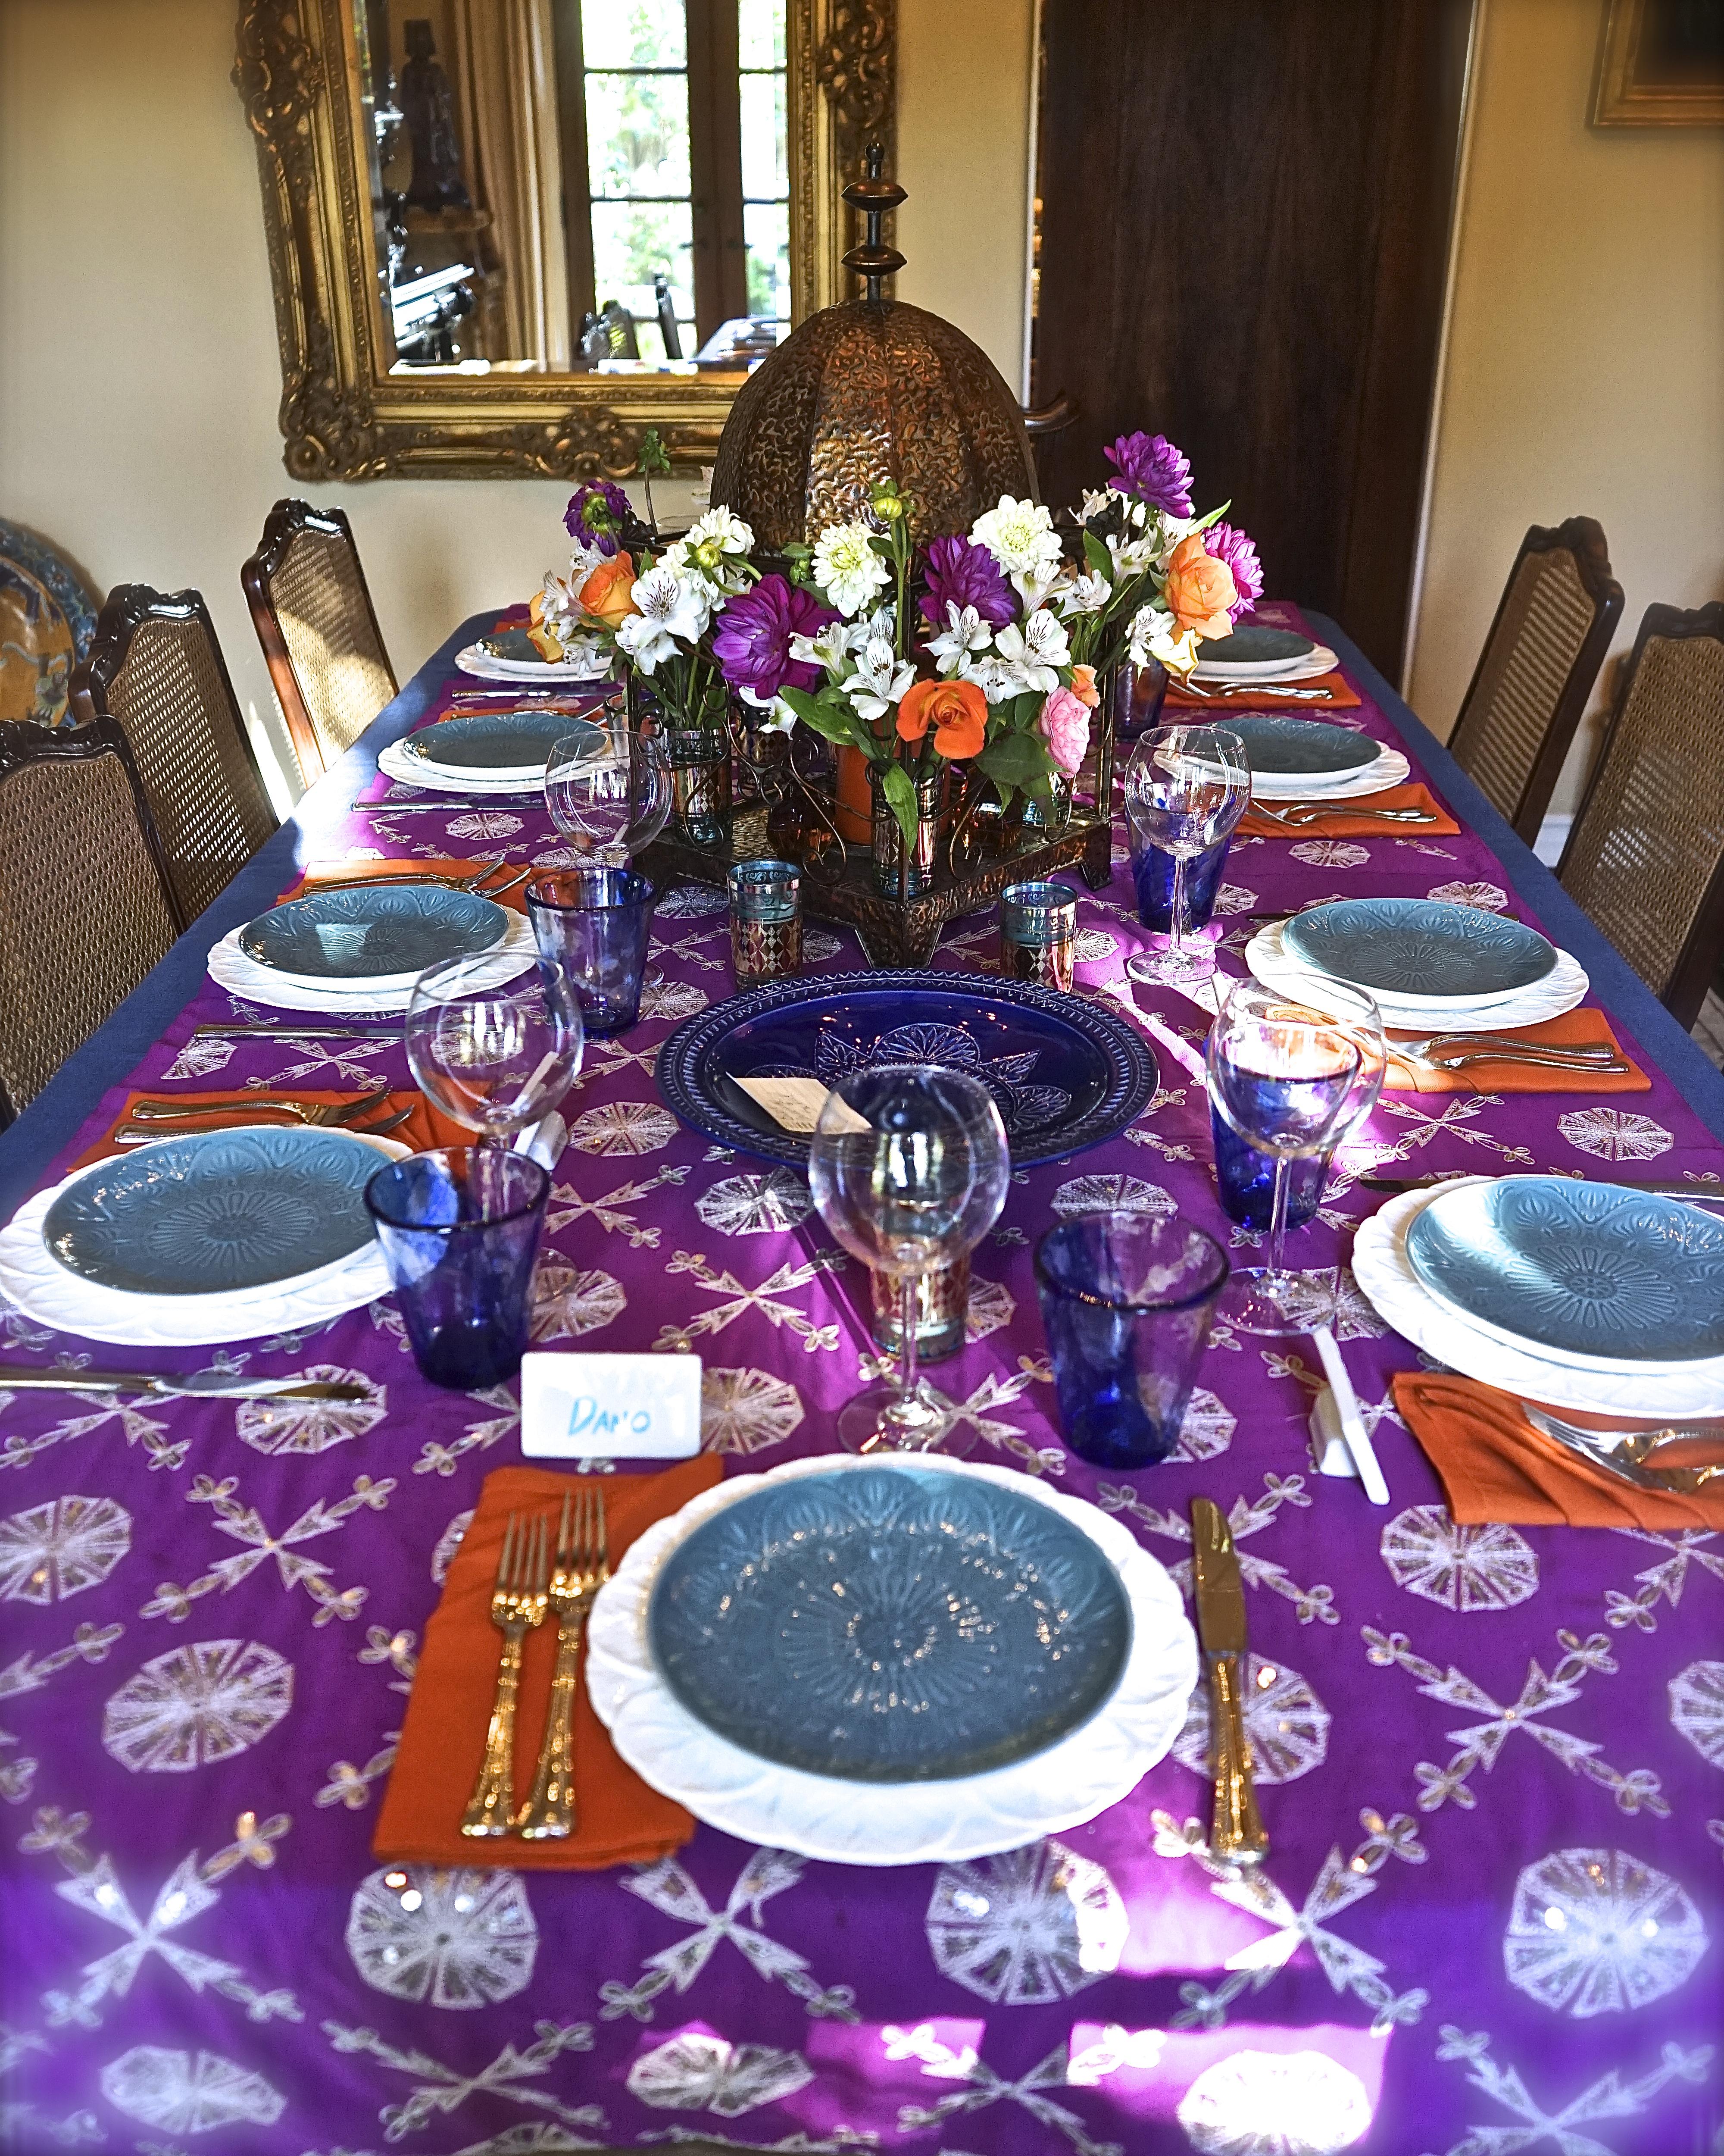 Moroccan Feast: Tabletop